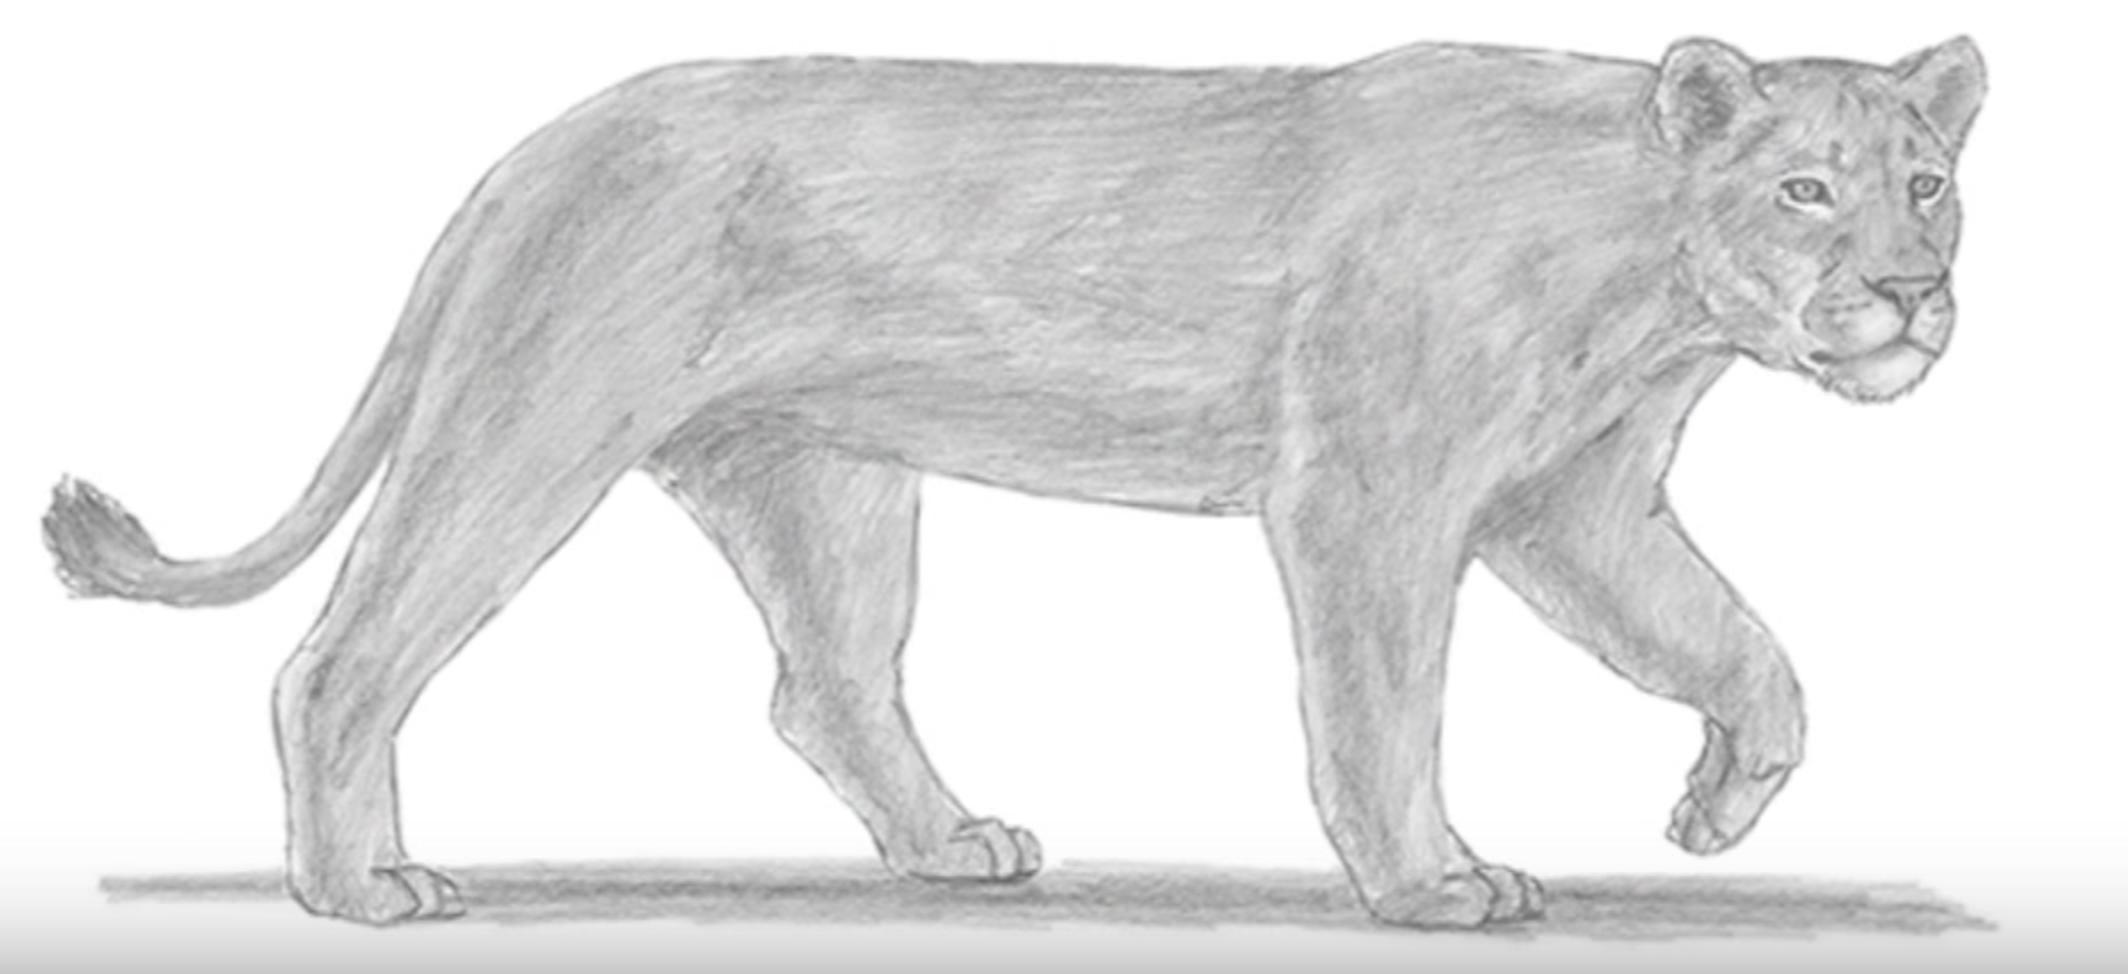 фото рисунки львов карандашом, идеи фото 5